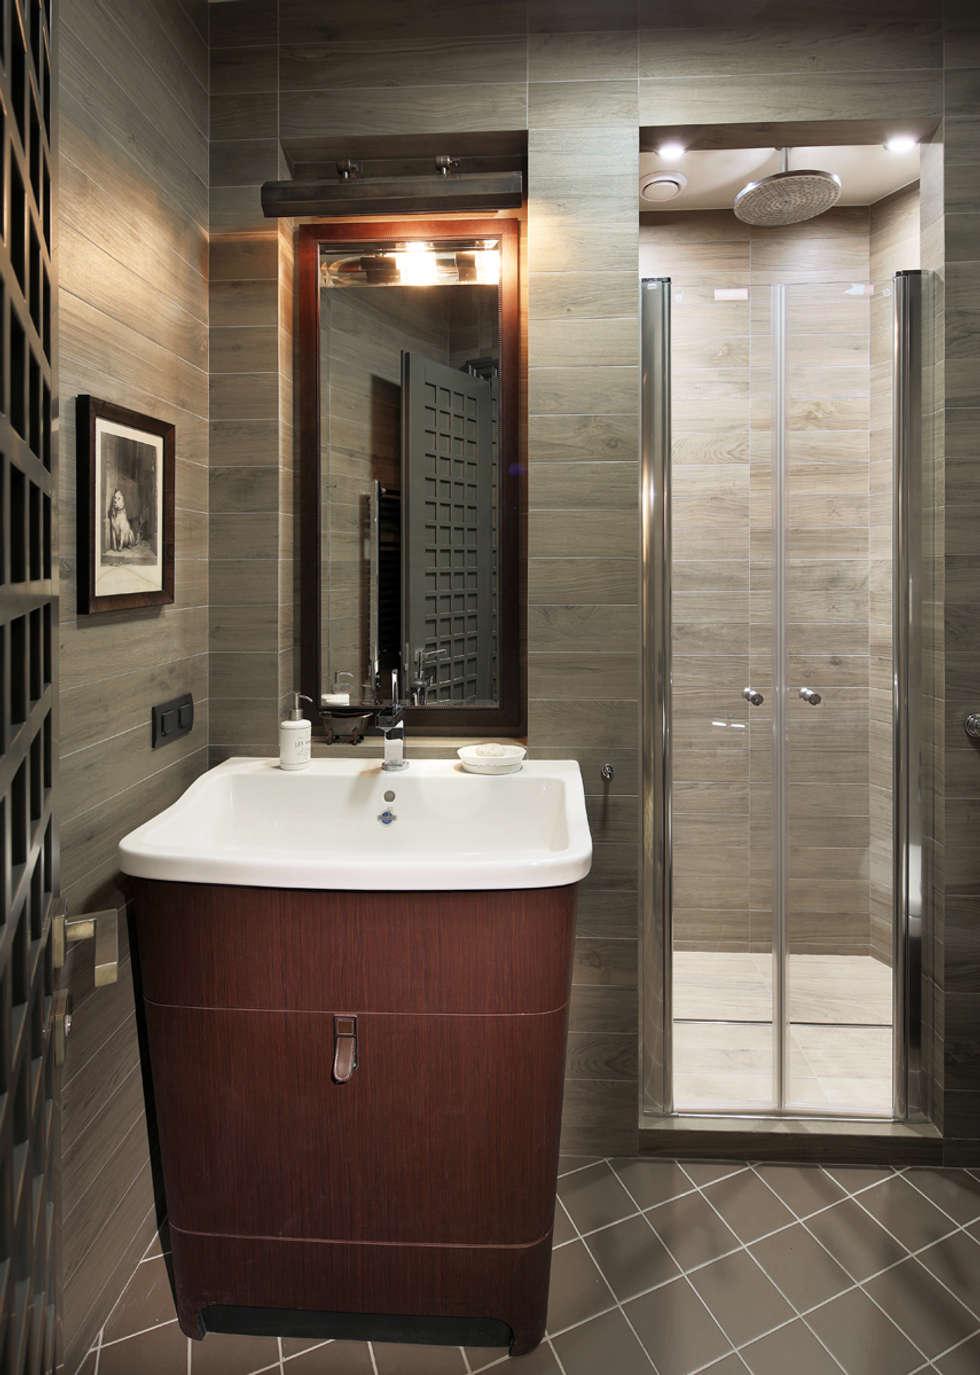 Apartment in Kurkino (Moscow) RU: Salle de bains de style  par Petr Kozeykin Designs LLC, 'PS Pierreswatch'